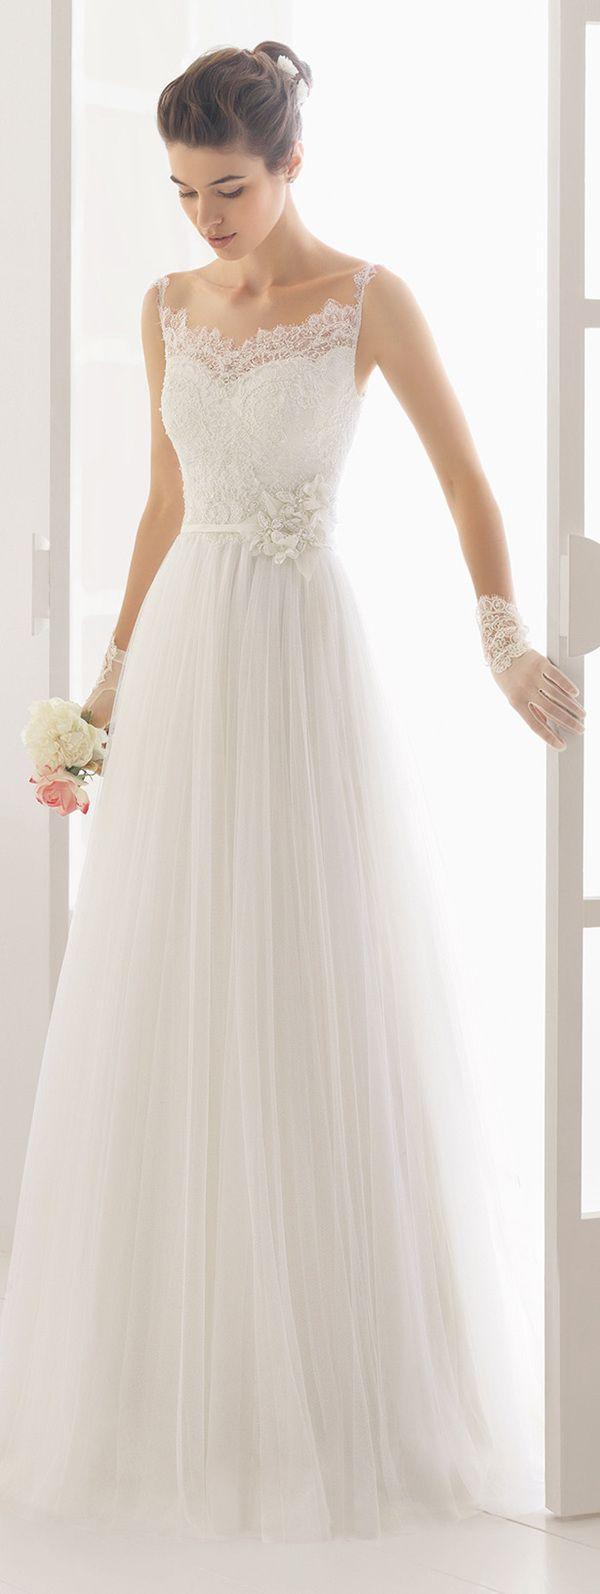 Aire Barcelona charm lace wedding dresses 2016 with thin straps  #vestidodenovia | #trajesdenovio | vestidos de novia para gorditas | vestidos de novia cortos  http://amzn.to/29aGZWo